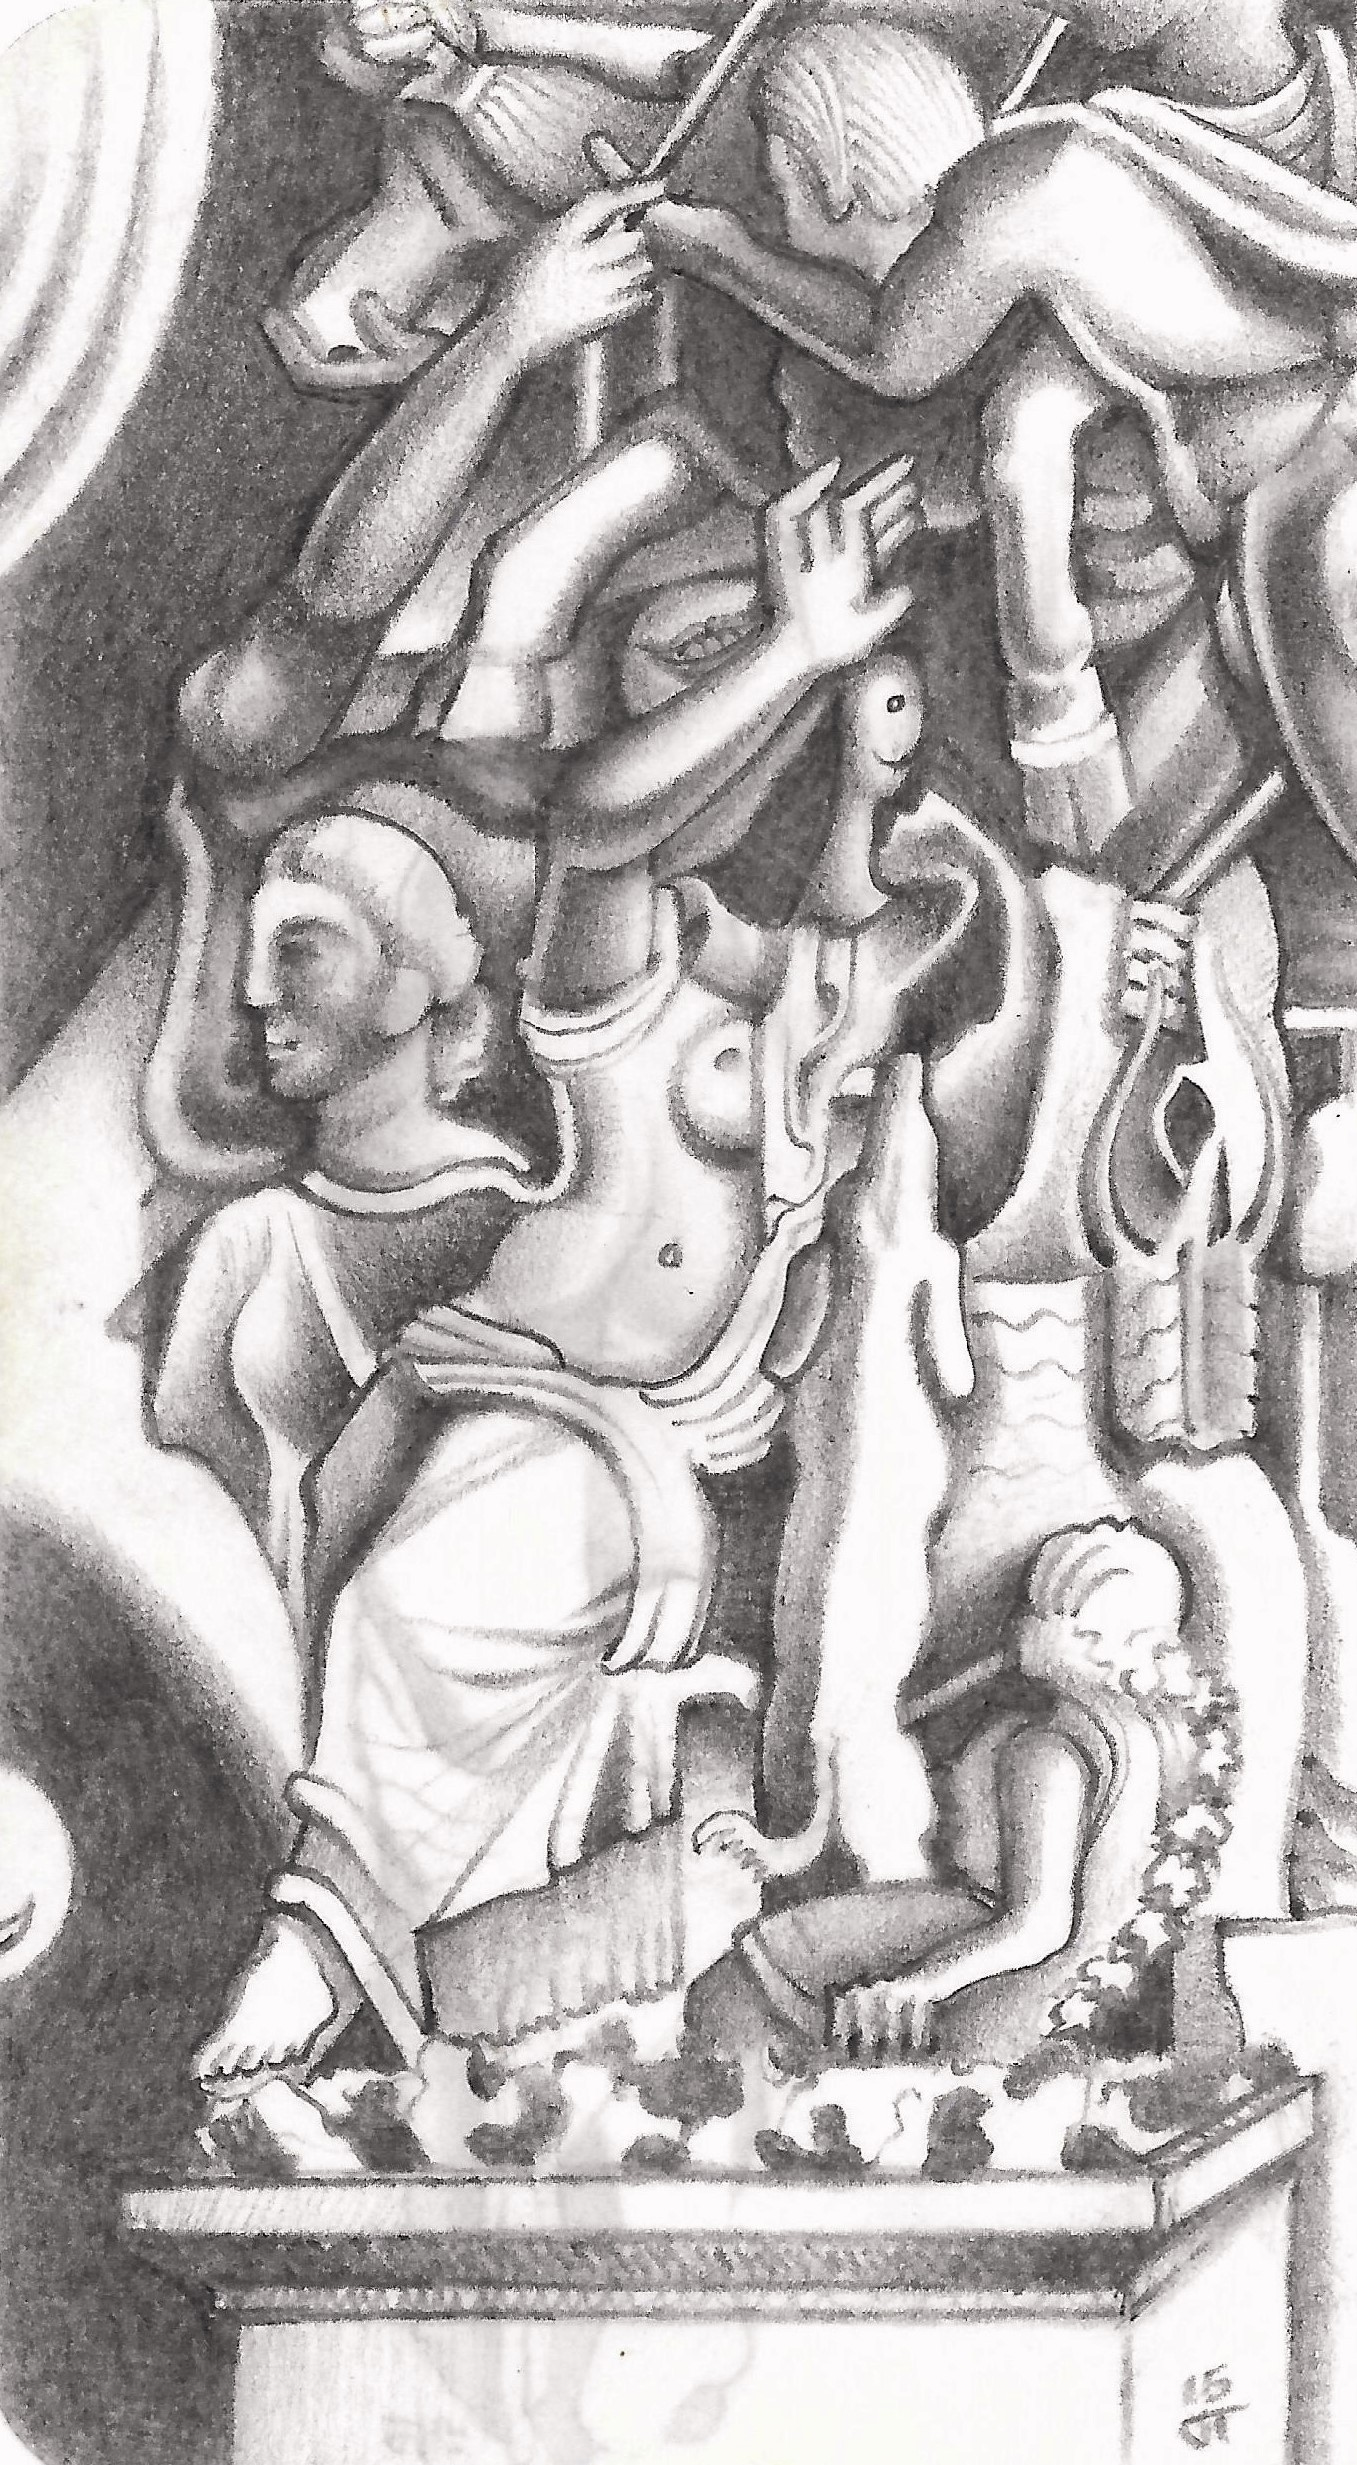 """The Farnese Bull"" Tripoli, 2015, pencil on paper."